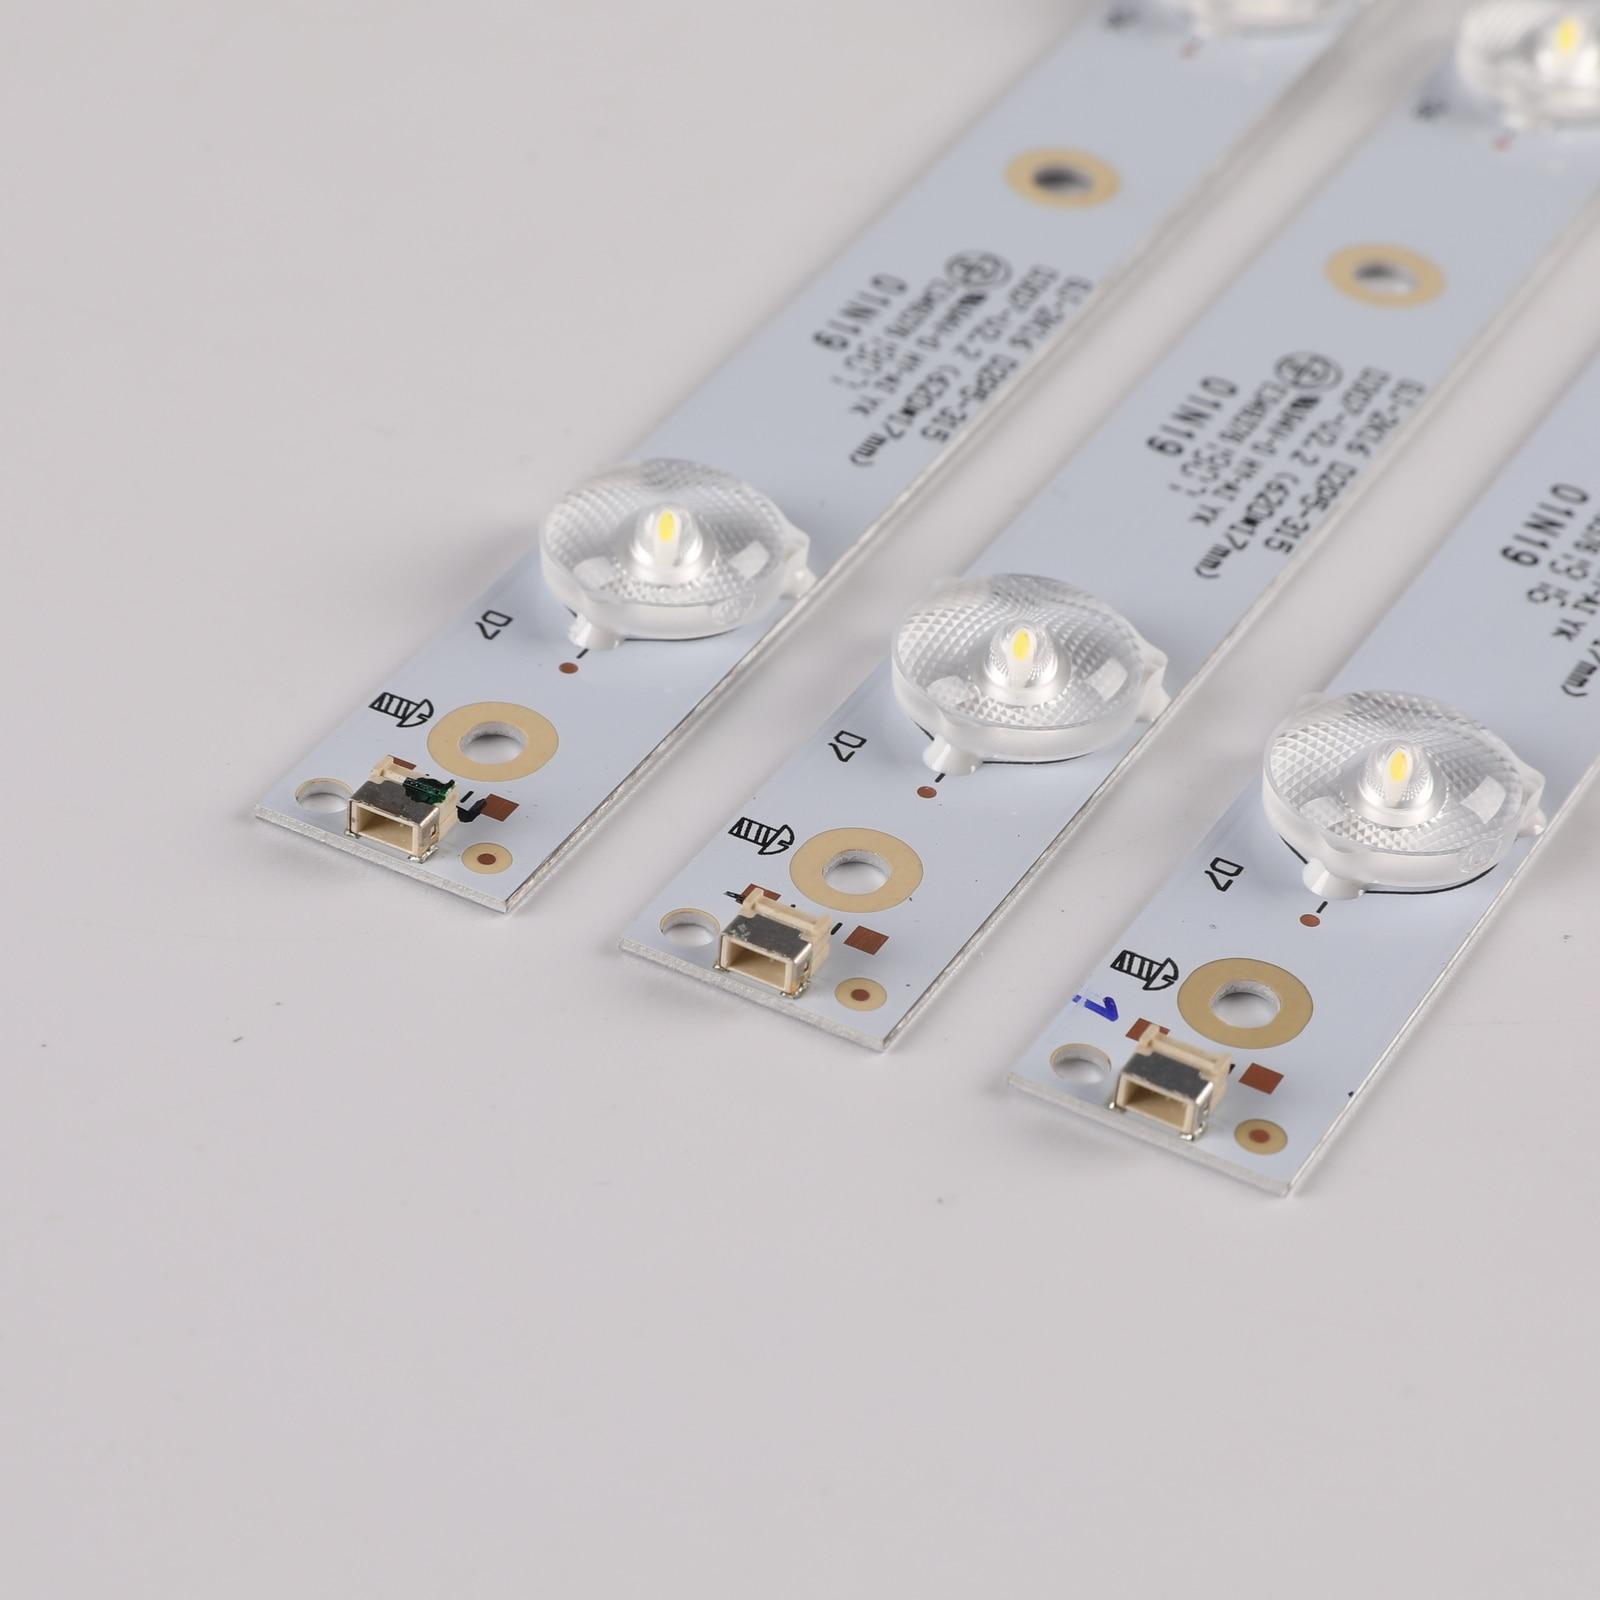 620mm 7 Lamp GJ-2K16 GEMINI-315 D307-V1.1 LBM320M0701-LD-1(5) GJ-2K16 D2P5-315 D307-V2.2 LB32080 LB32080 V0-00 03 LED Strip Bar